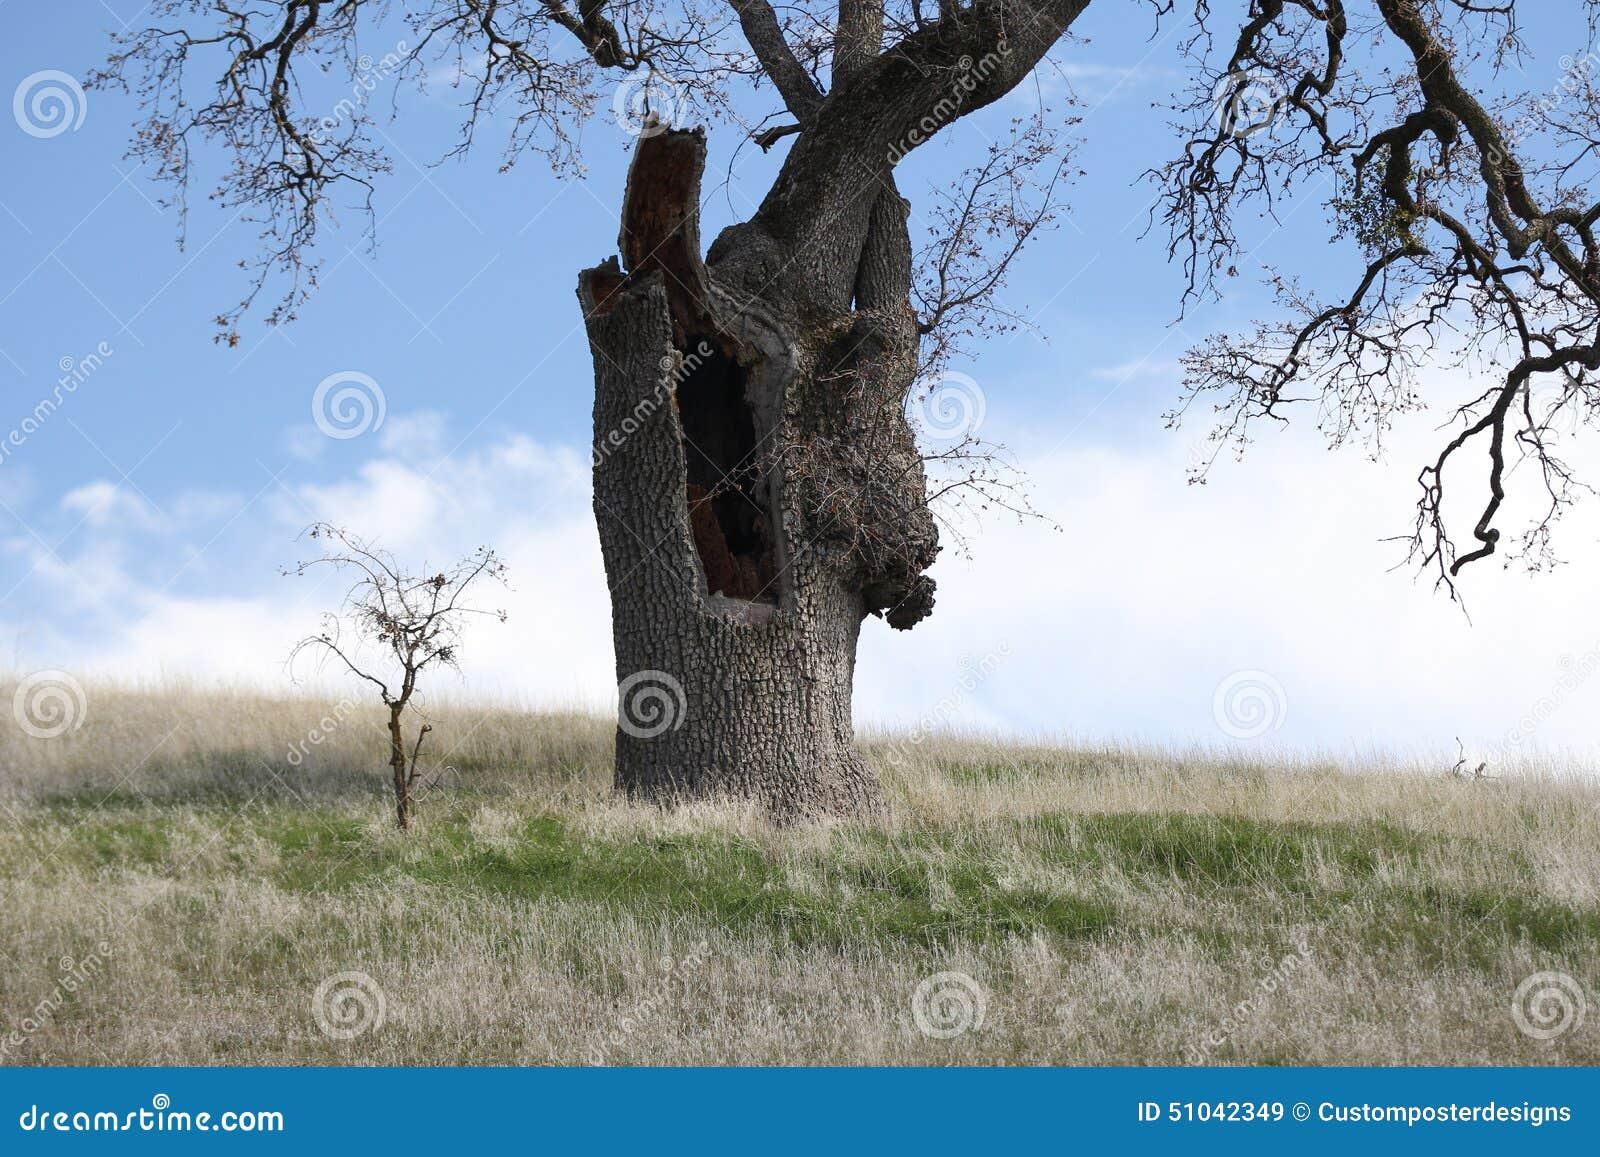 Download Big tree little tree. stock image. Image of landscape - 51042349